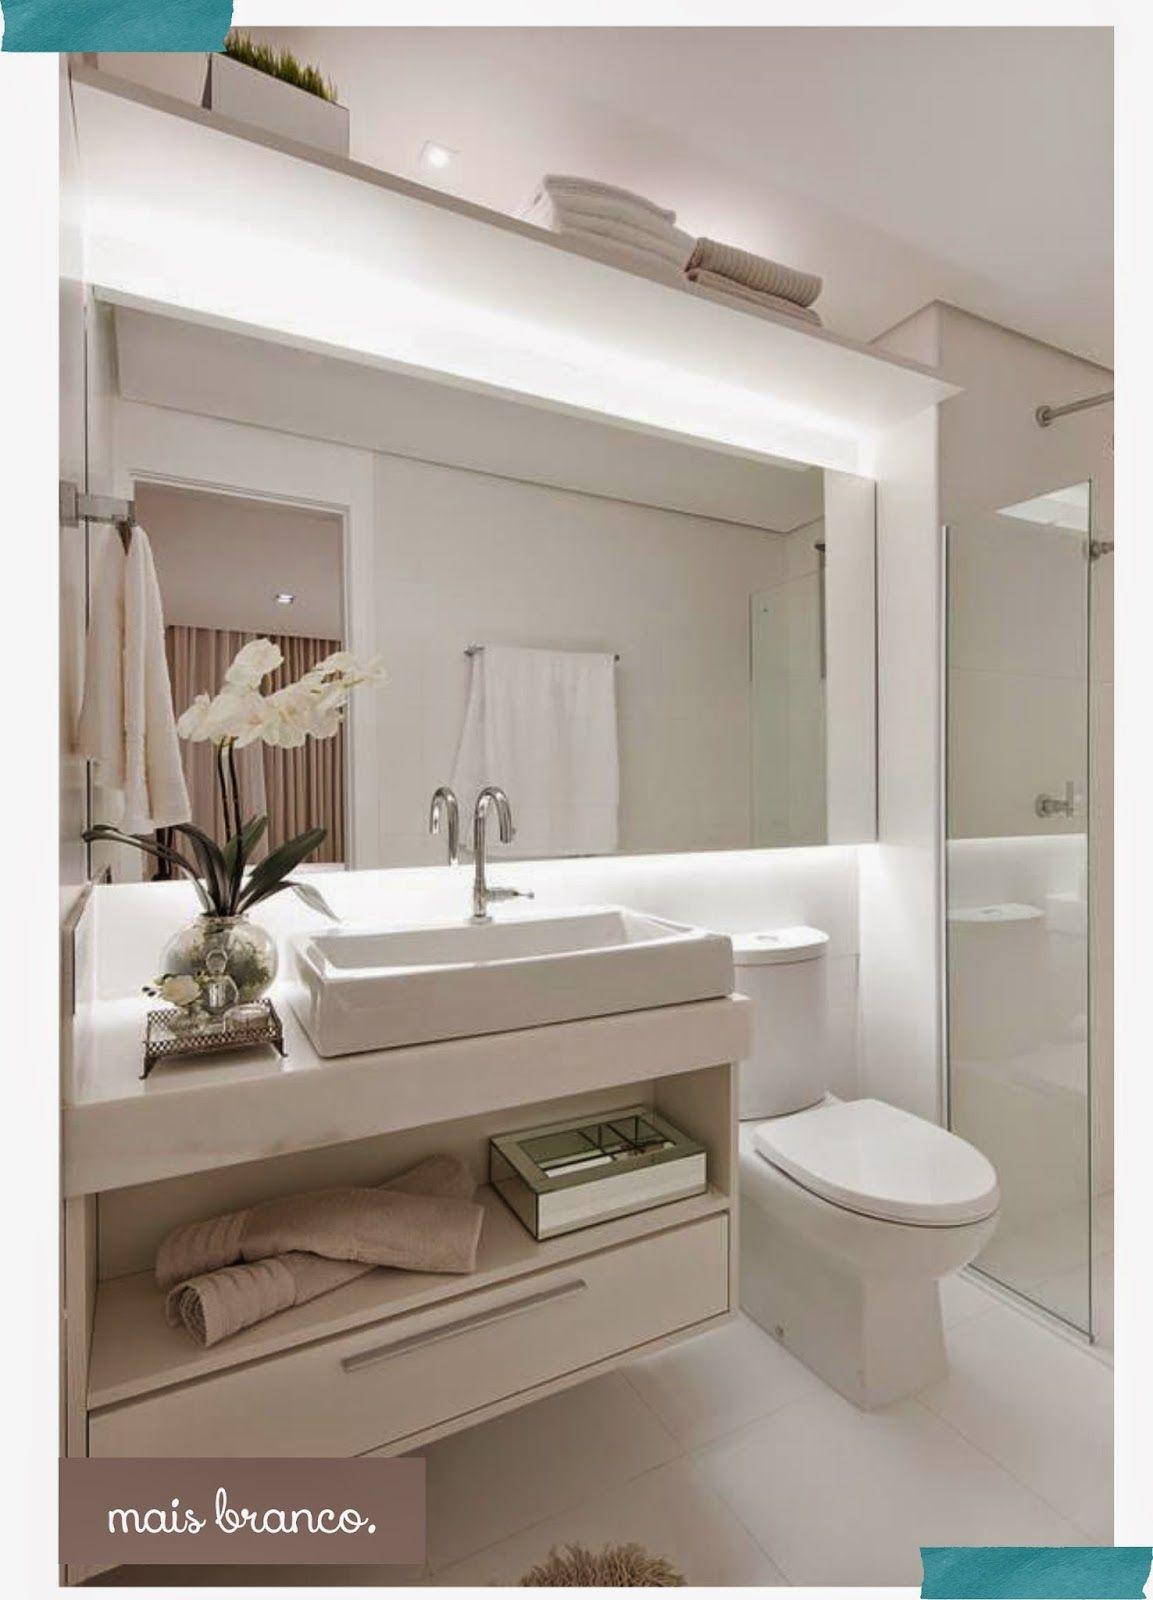 4jpg 11531600 Bathroom DesignsBathroom 4jpg 11531600